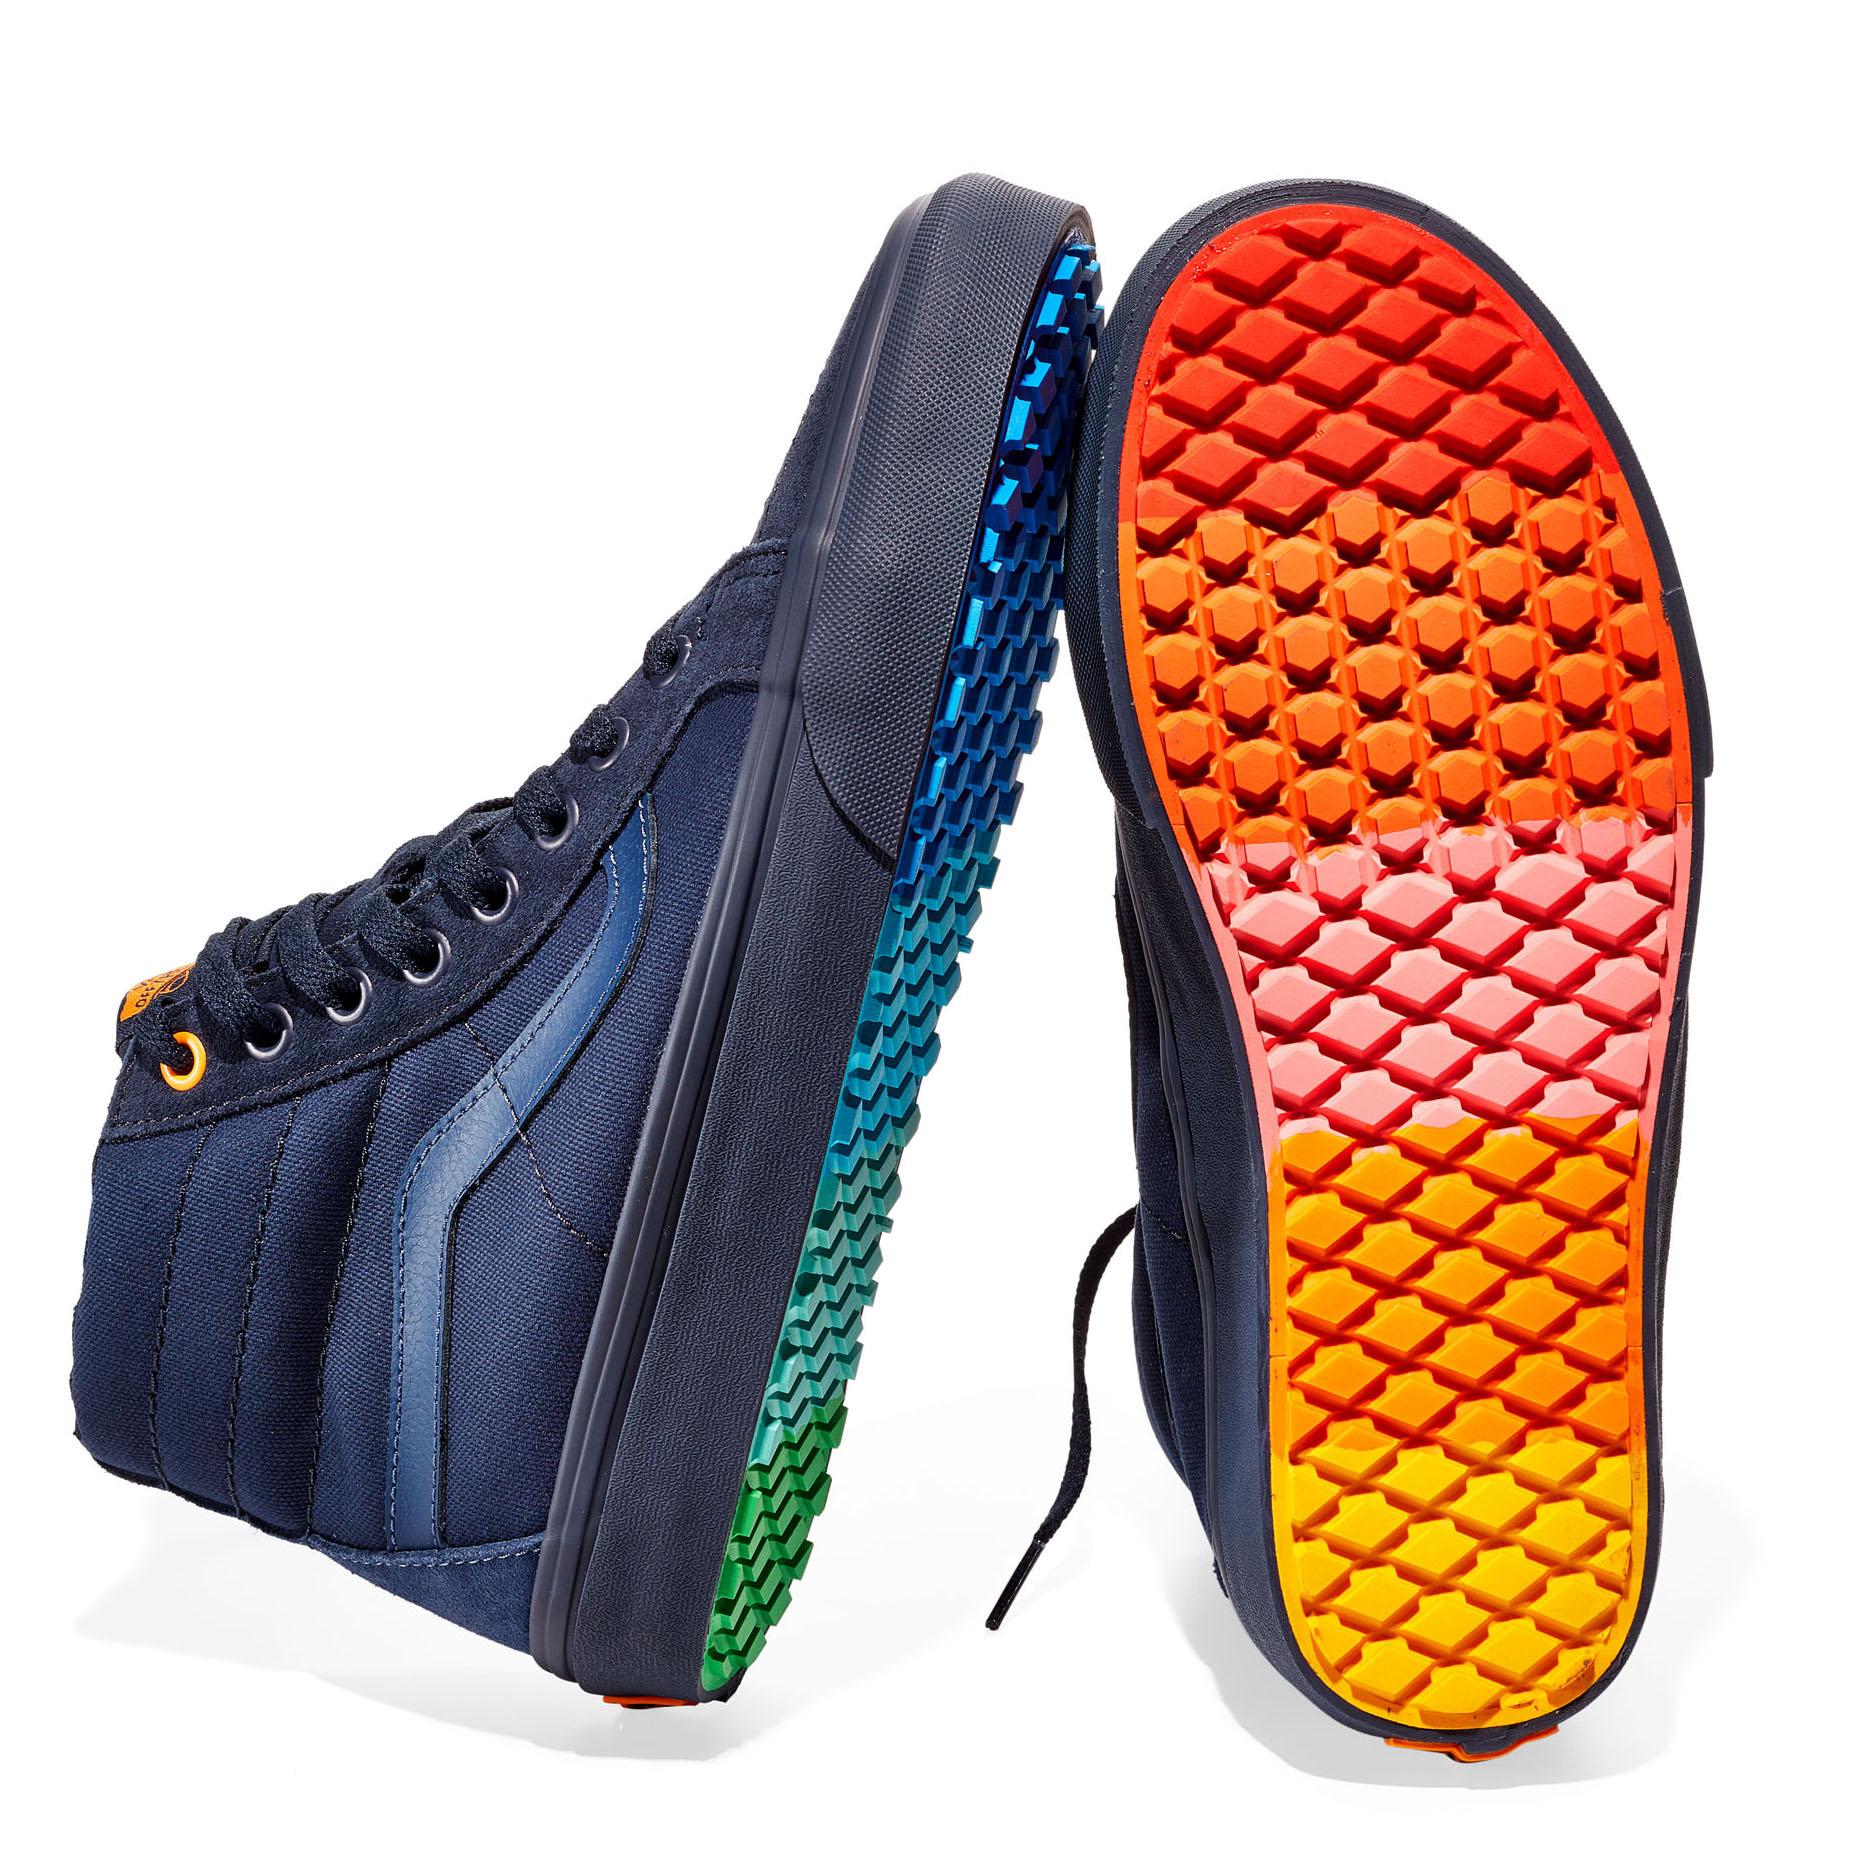 multi-colored vans high-top sneakers